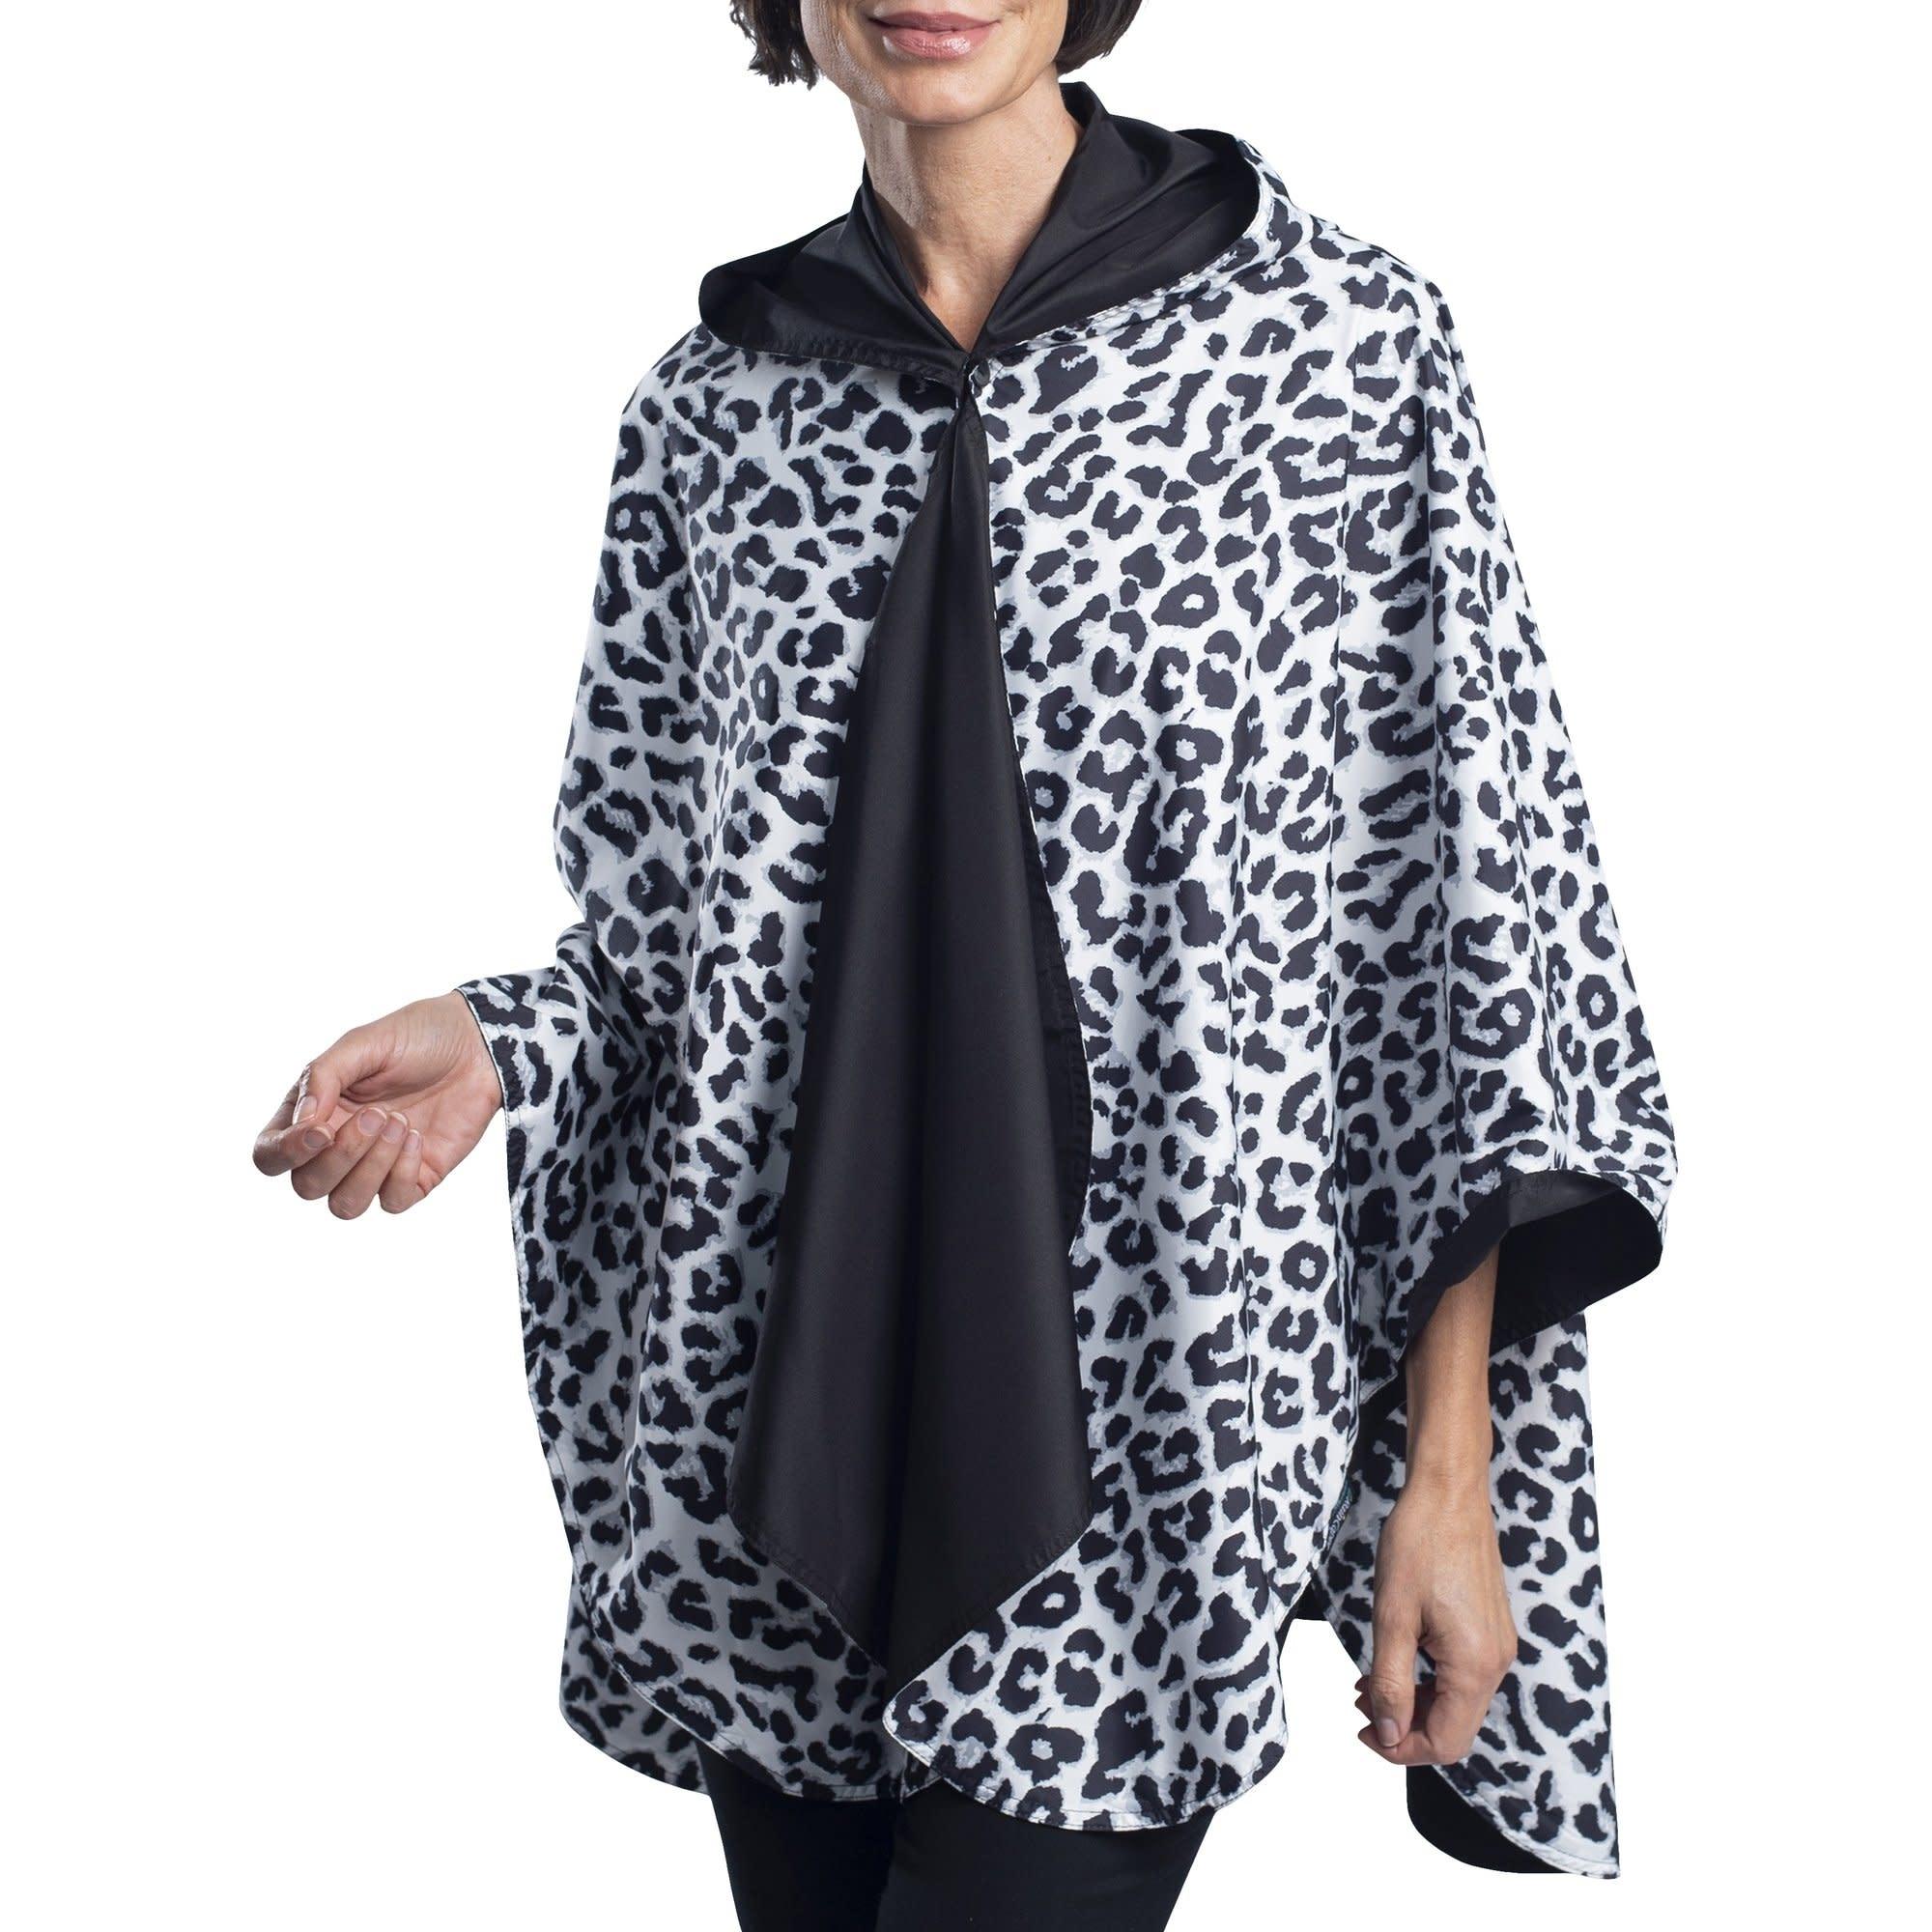 Rain Caper Jacket Poncho